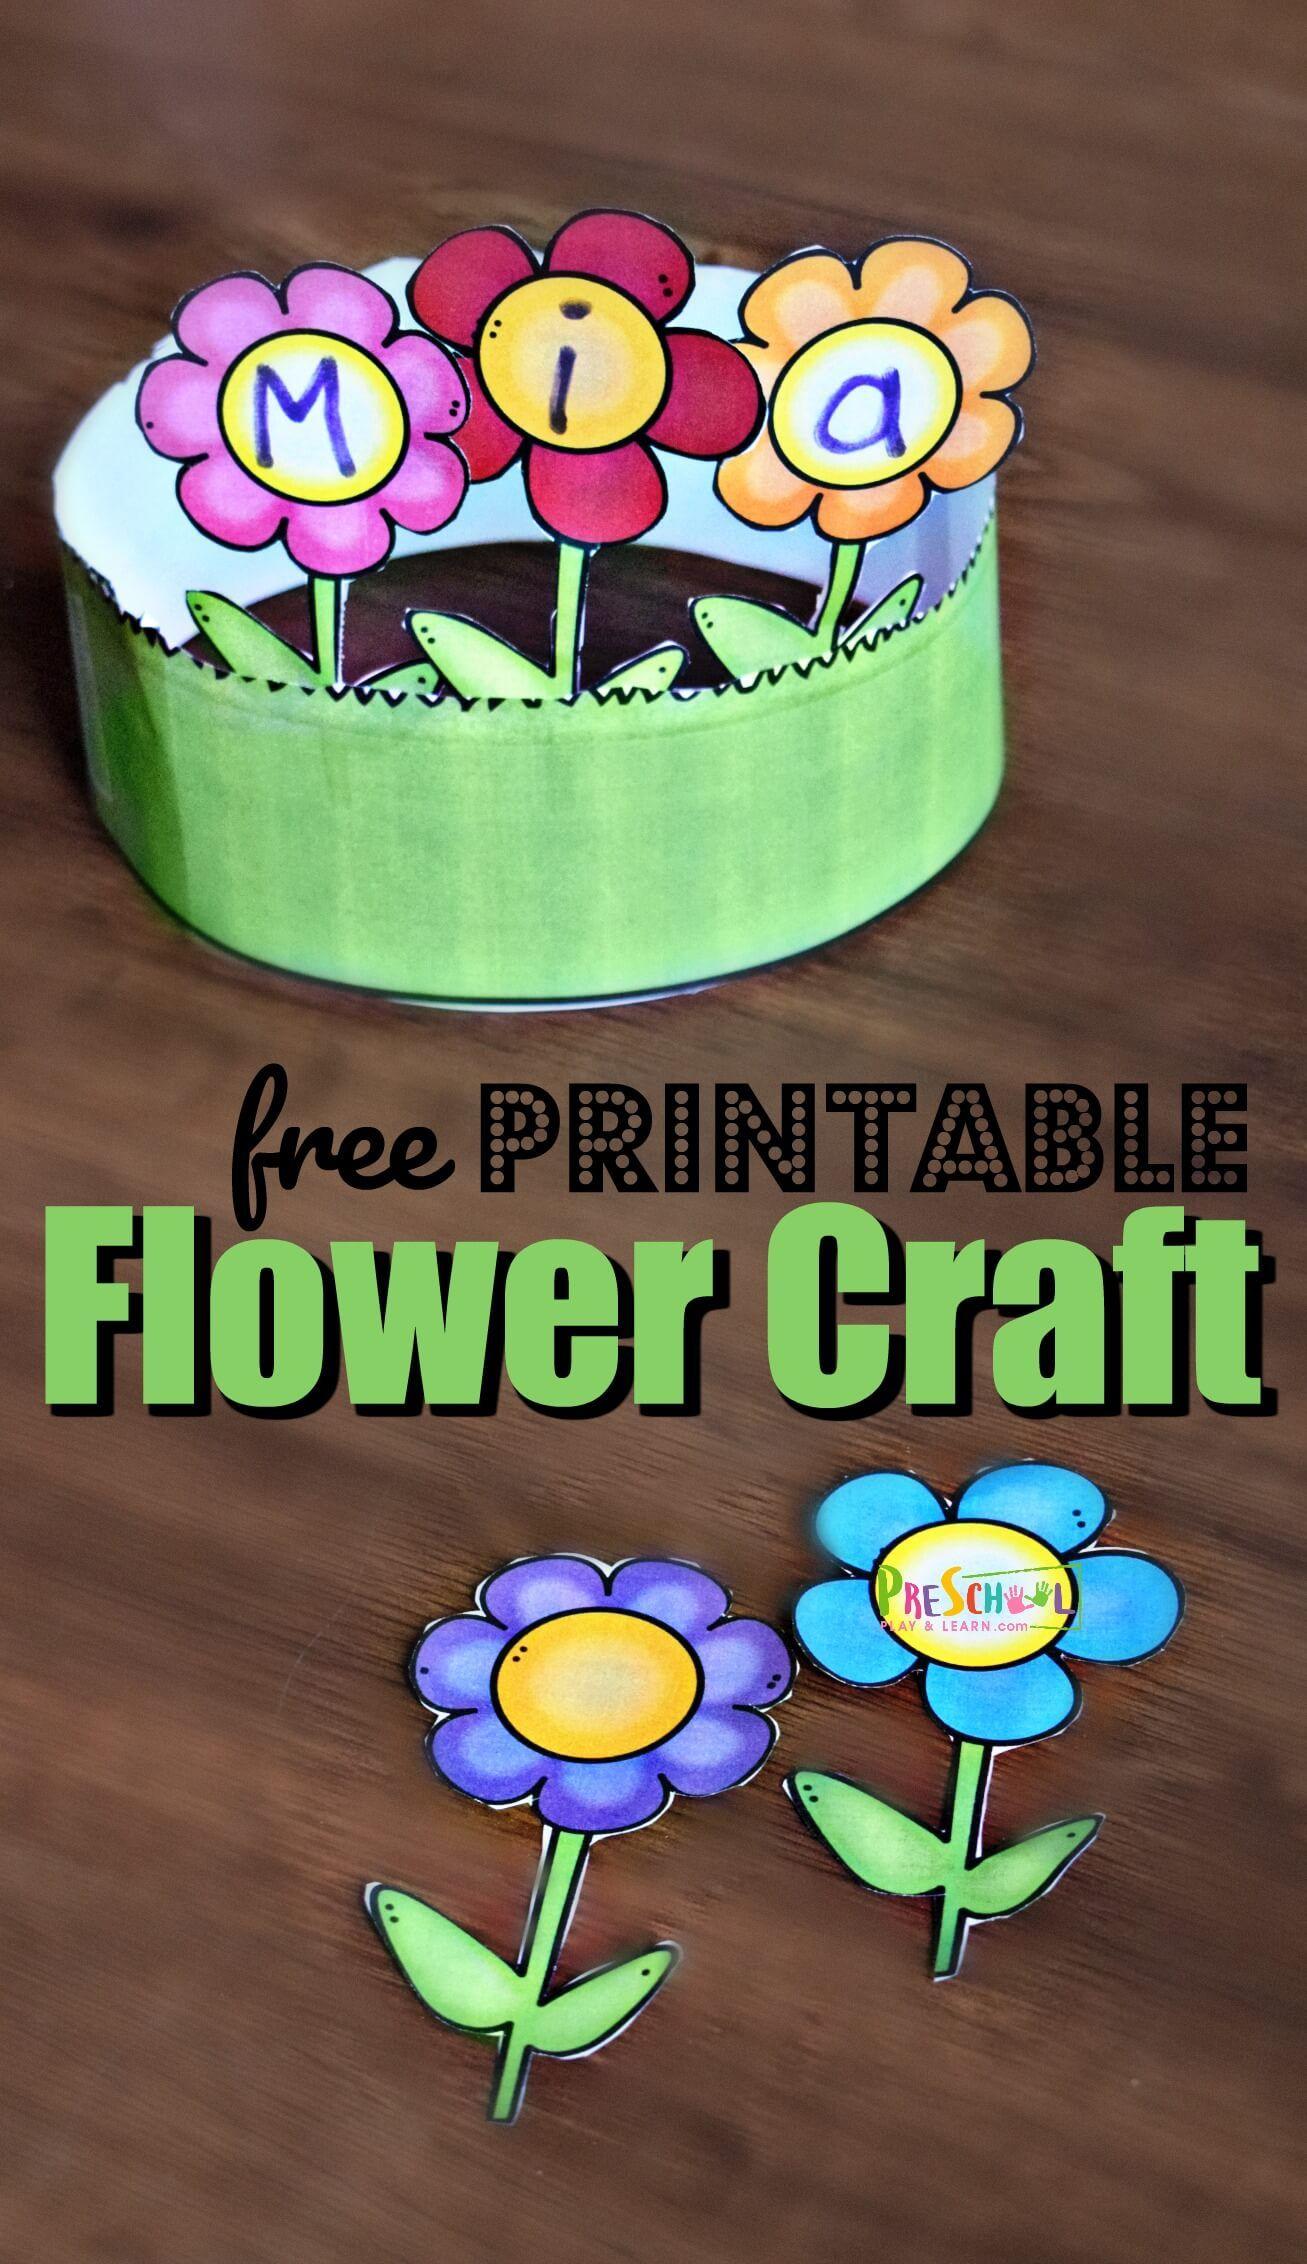 Free Printable Name Flower Craft